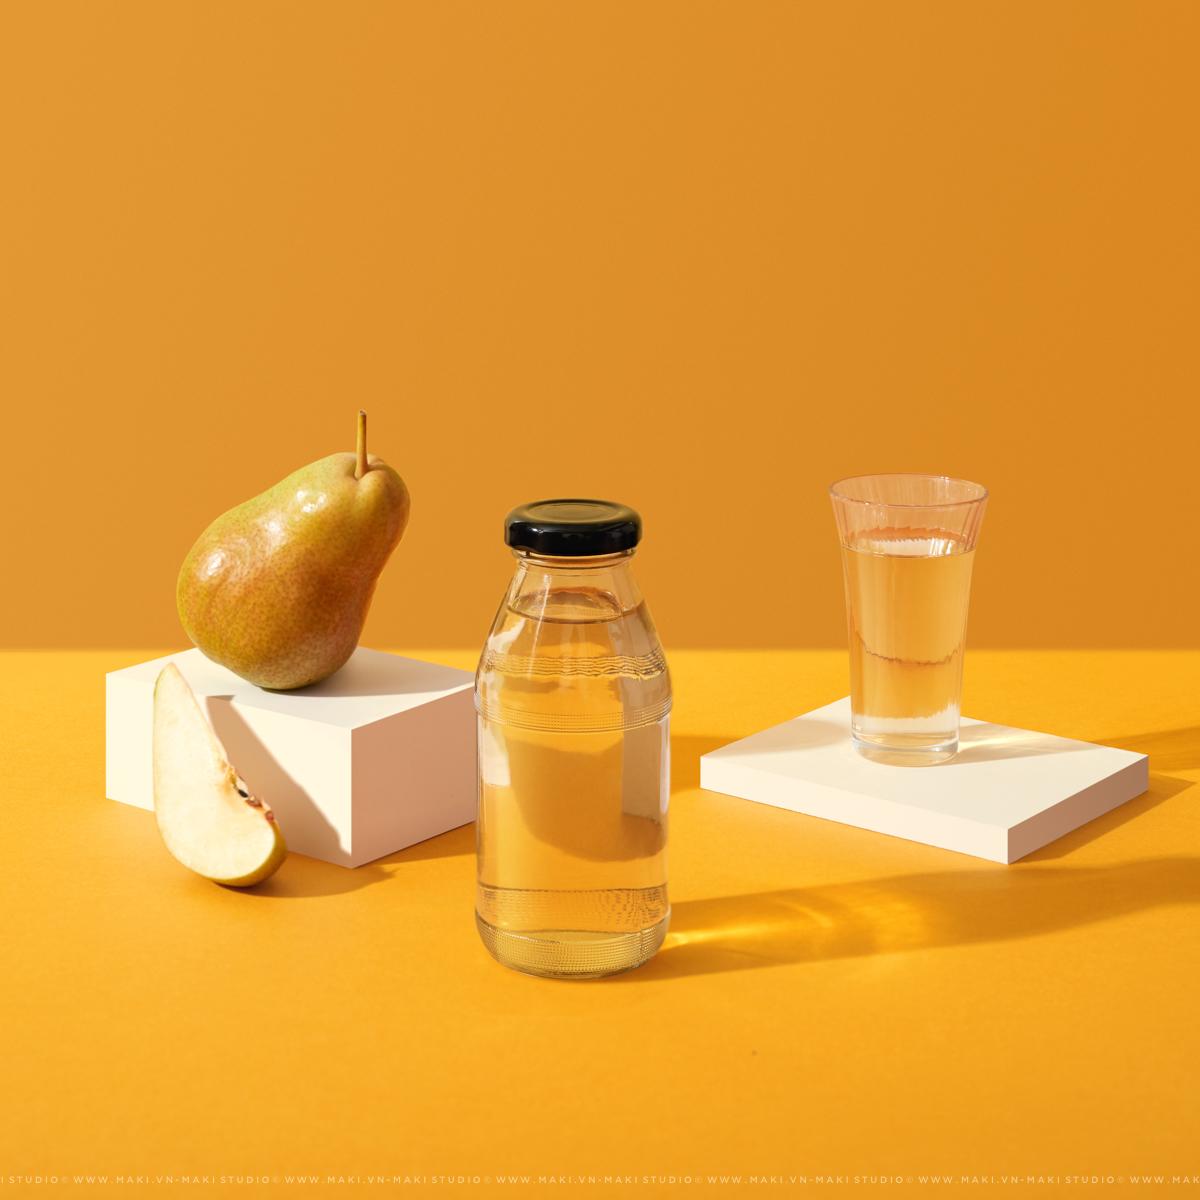 chup-anh-mon-an-summer-fruit-8.jpg